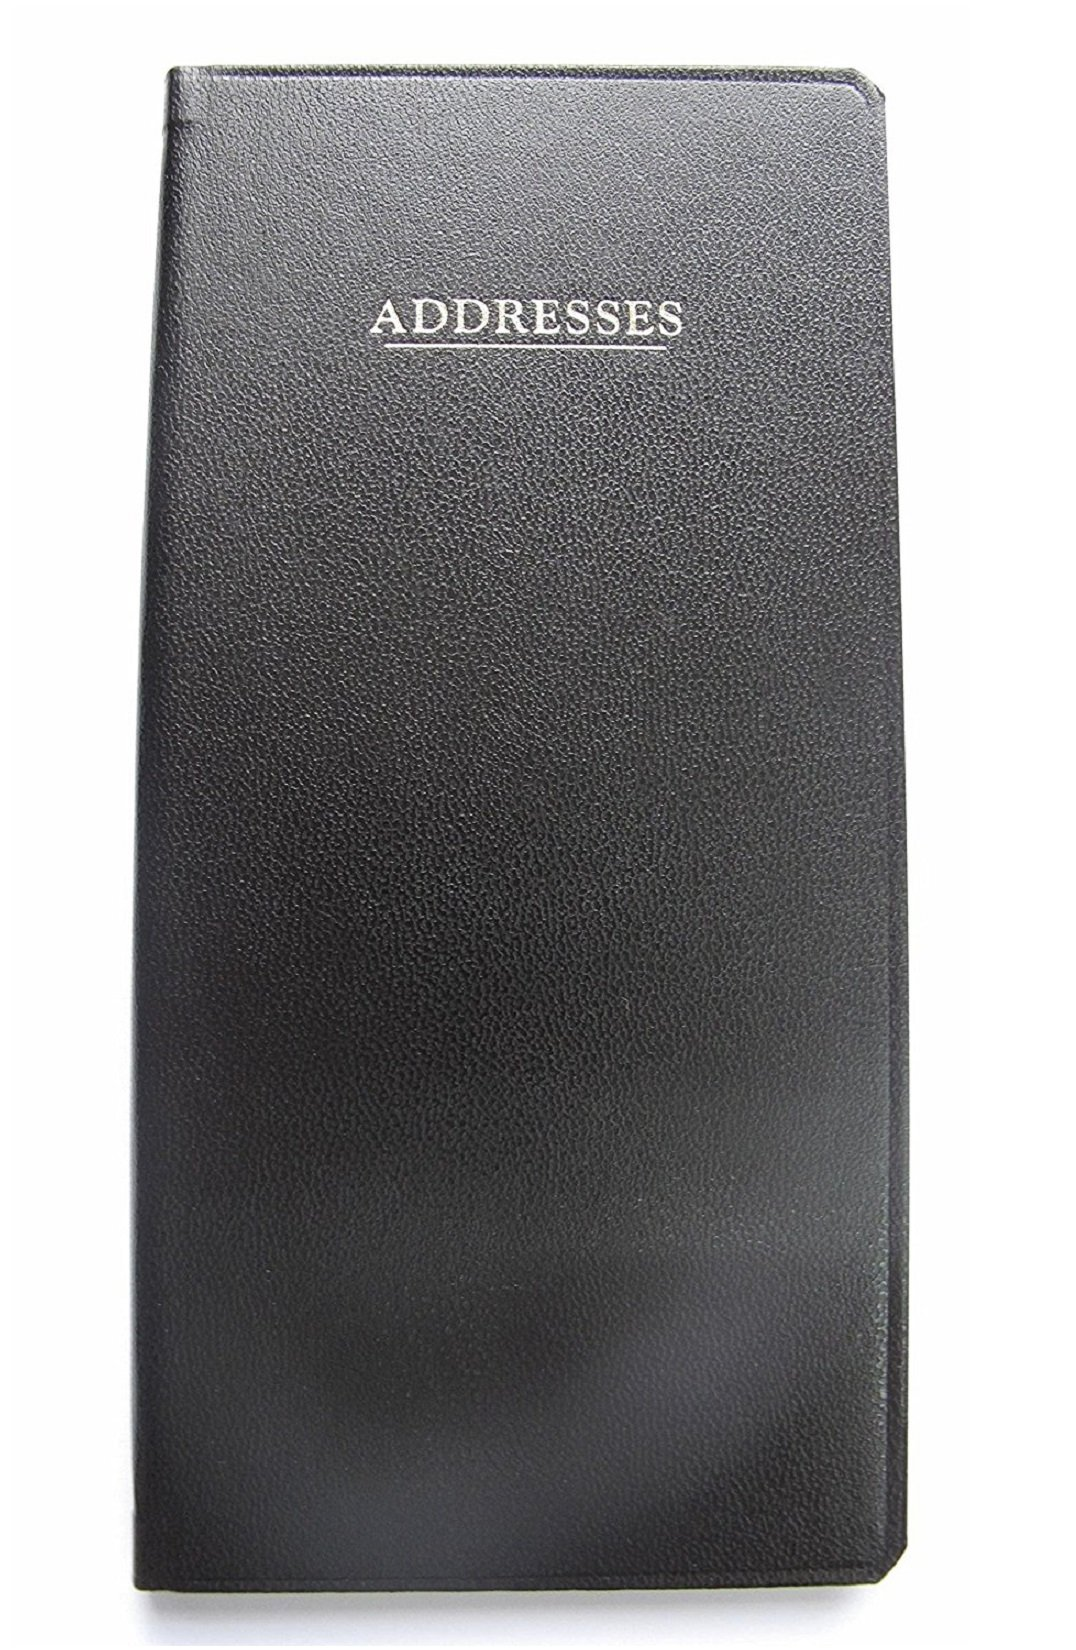 3 X Tallon Large XL Padded Address Book Black//Brown//Tan//Blue